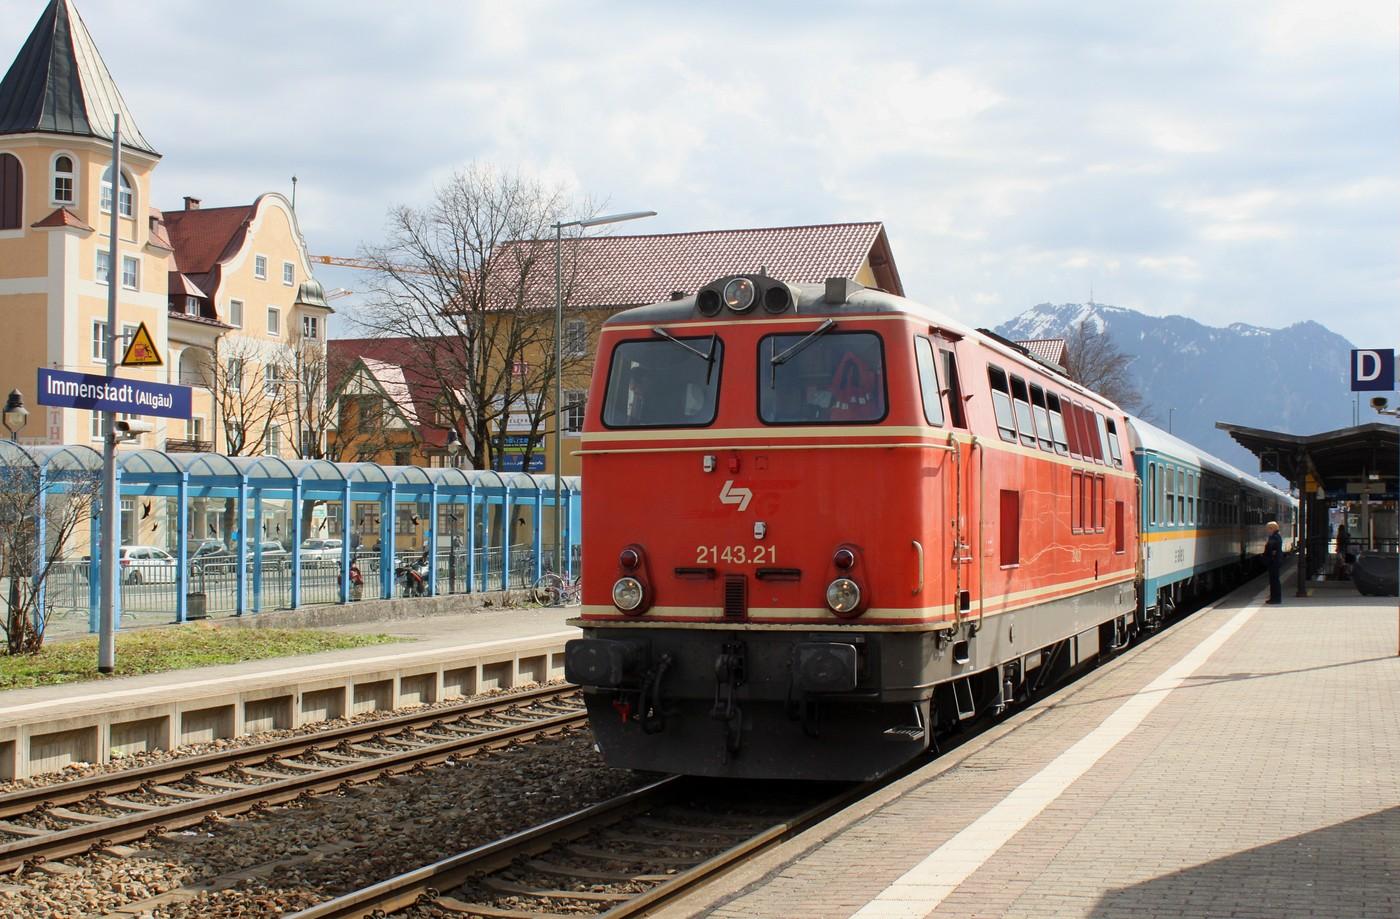 http://www.eisenbahn-im-bild.de/Temp/D_13_Immen_IMG_0006.jpg